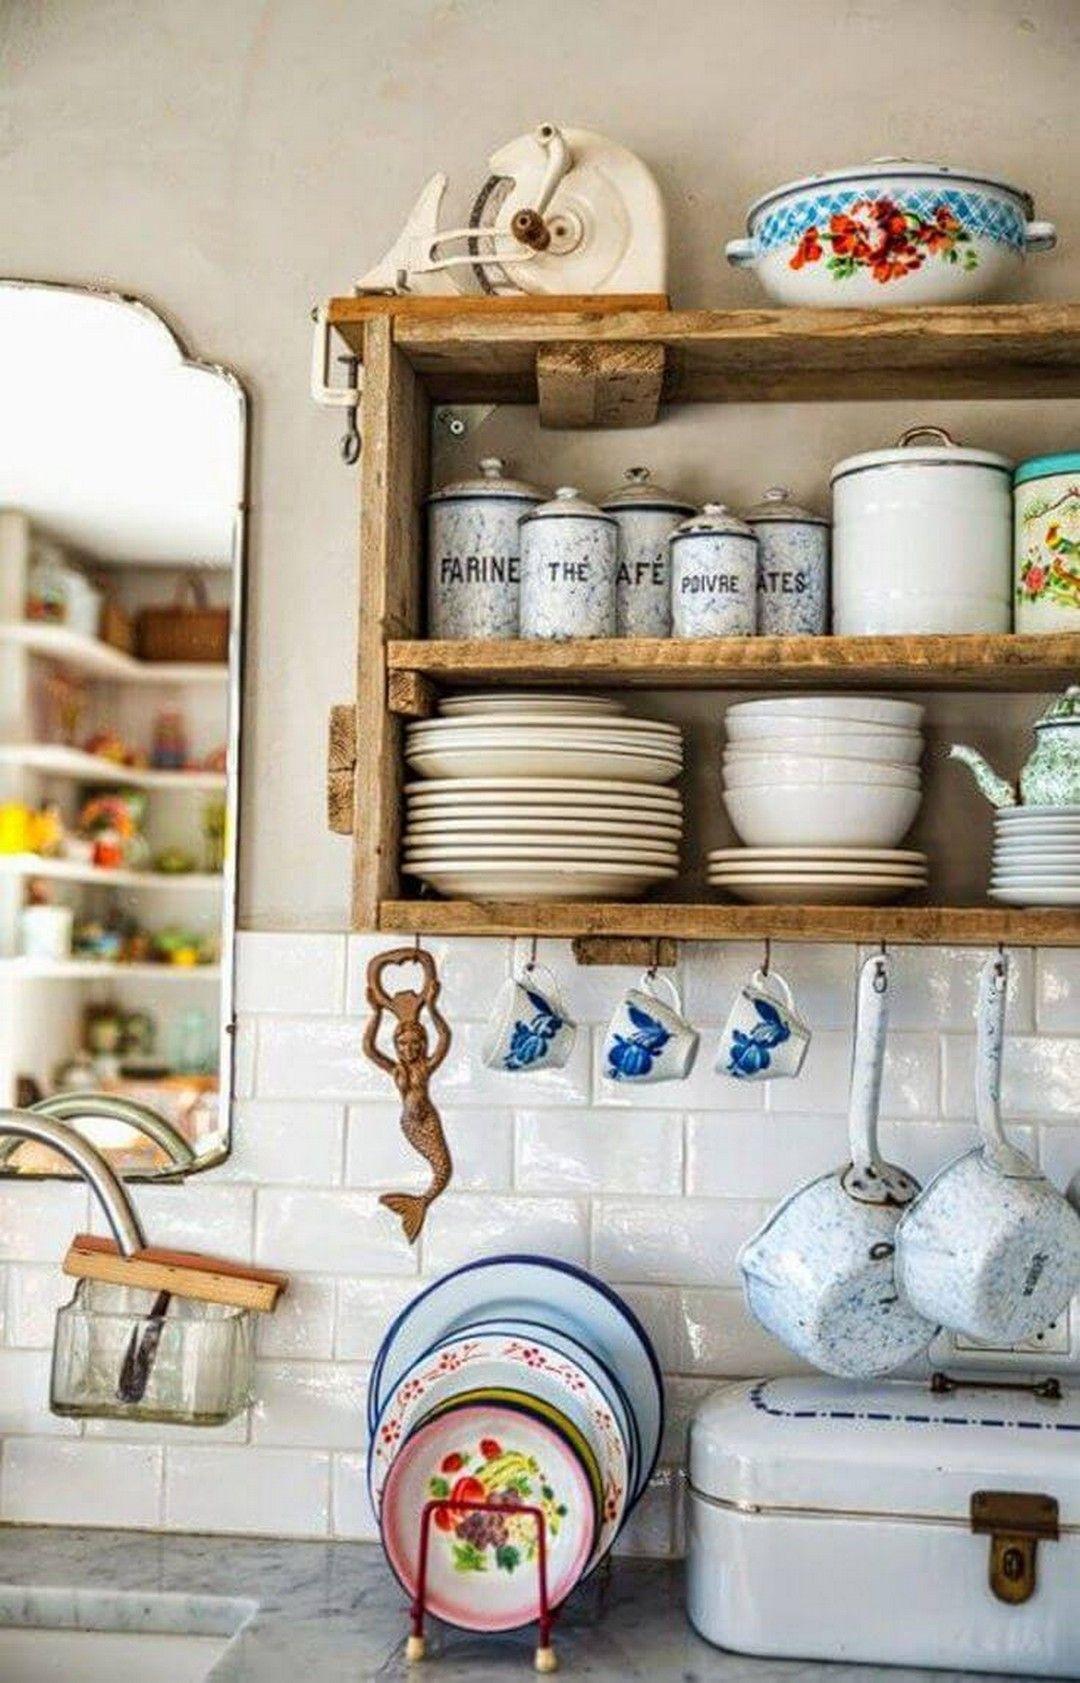 Farmhouse Kitchen Ideas On A Budget That Will Bring The Charm Shabby Chic Kitchen Vintage Kitchen Chic Kitchen